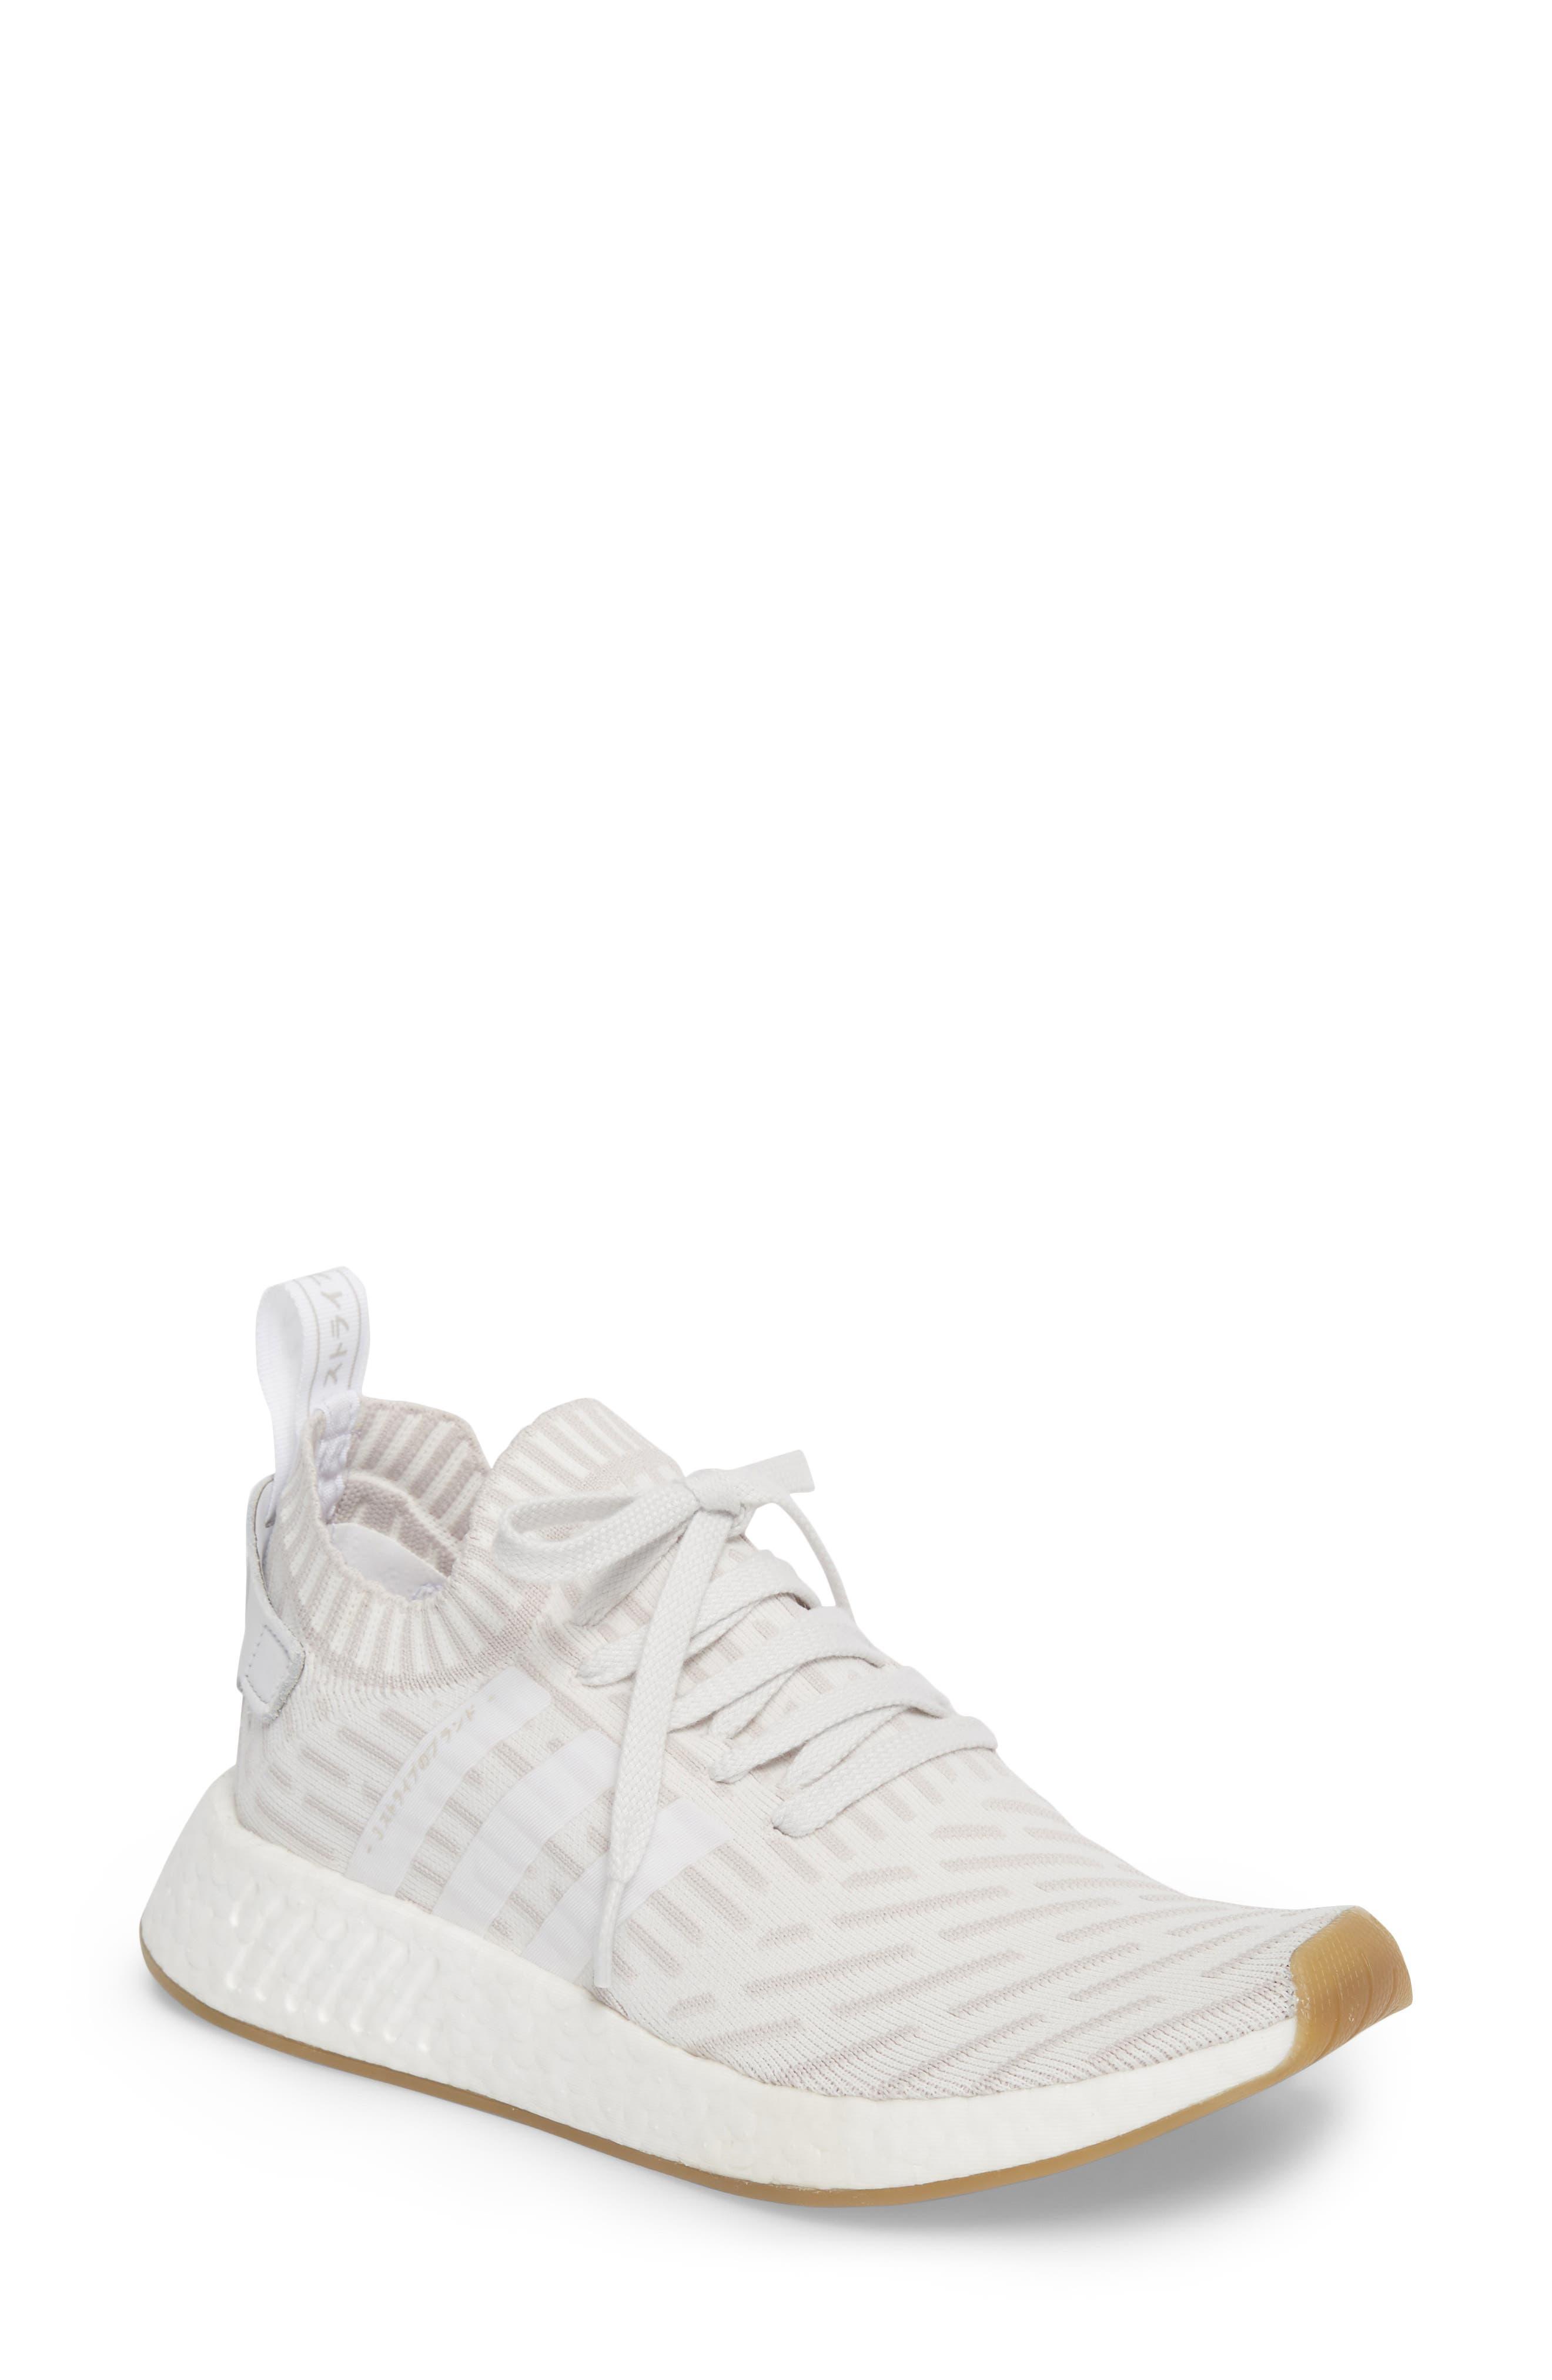 NMD R2 Primeknit Athletic Shoe,                         Main,                         color,